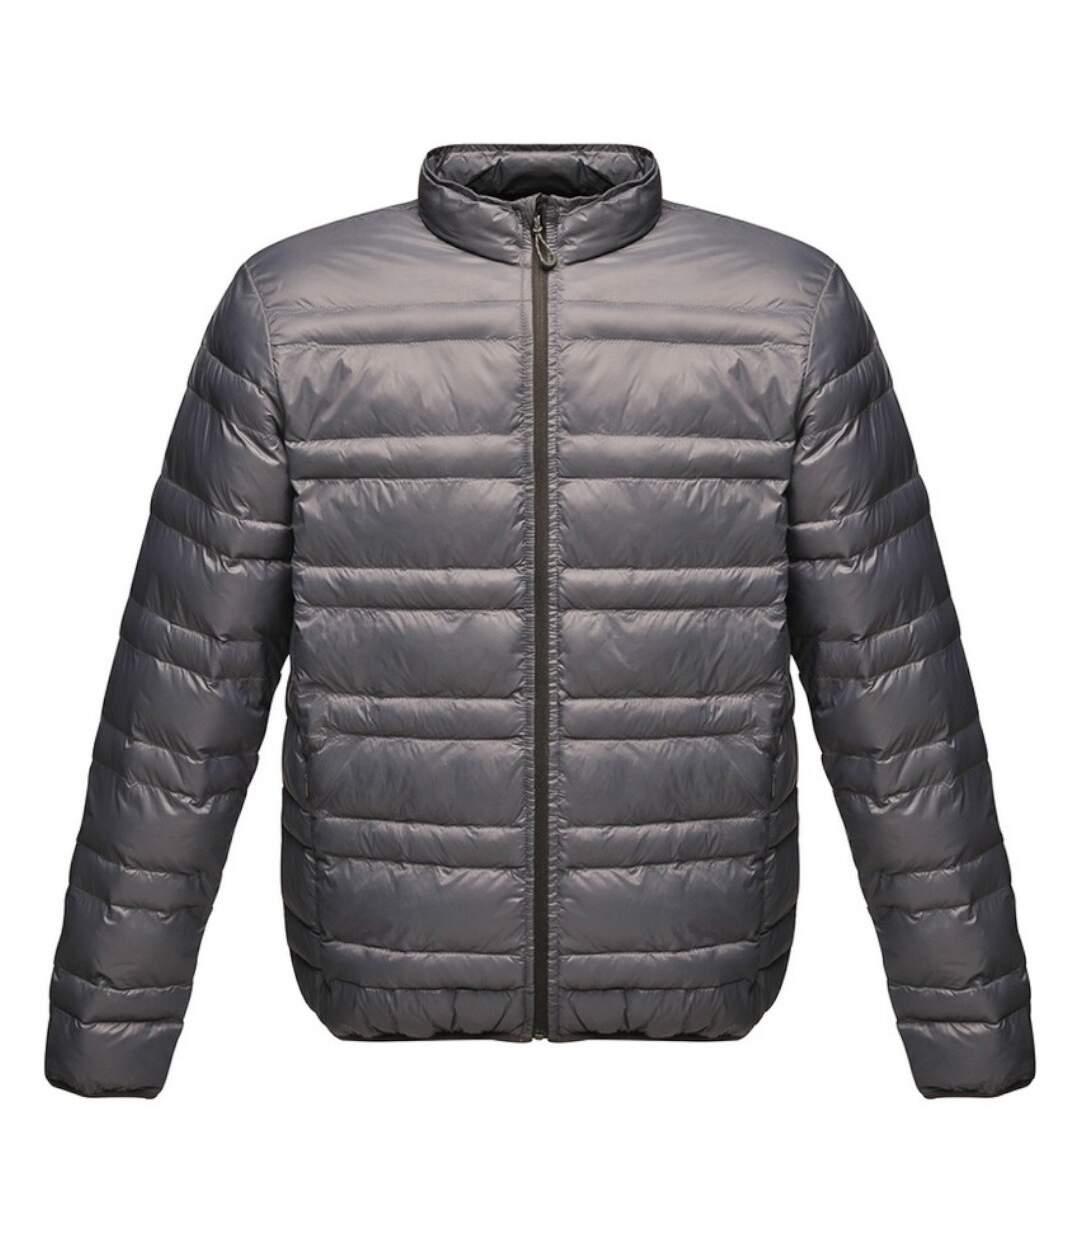 Regatta Professional Mens Firedown Insulated Jacket (Black/Red) - UTPC4051